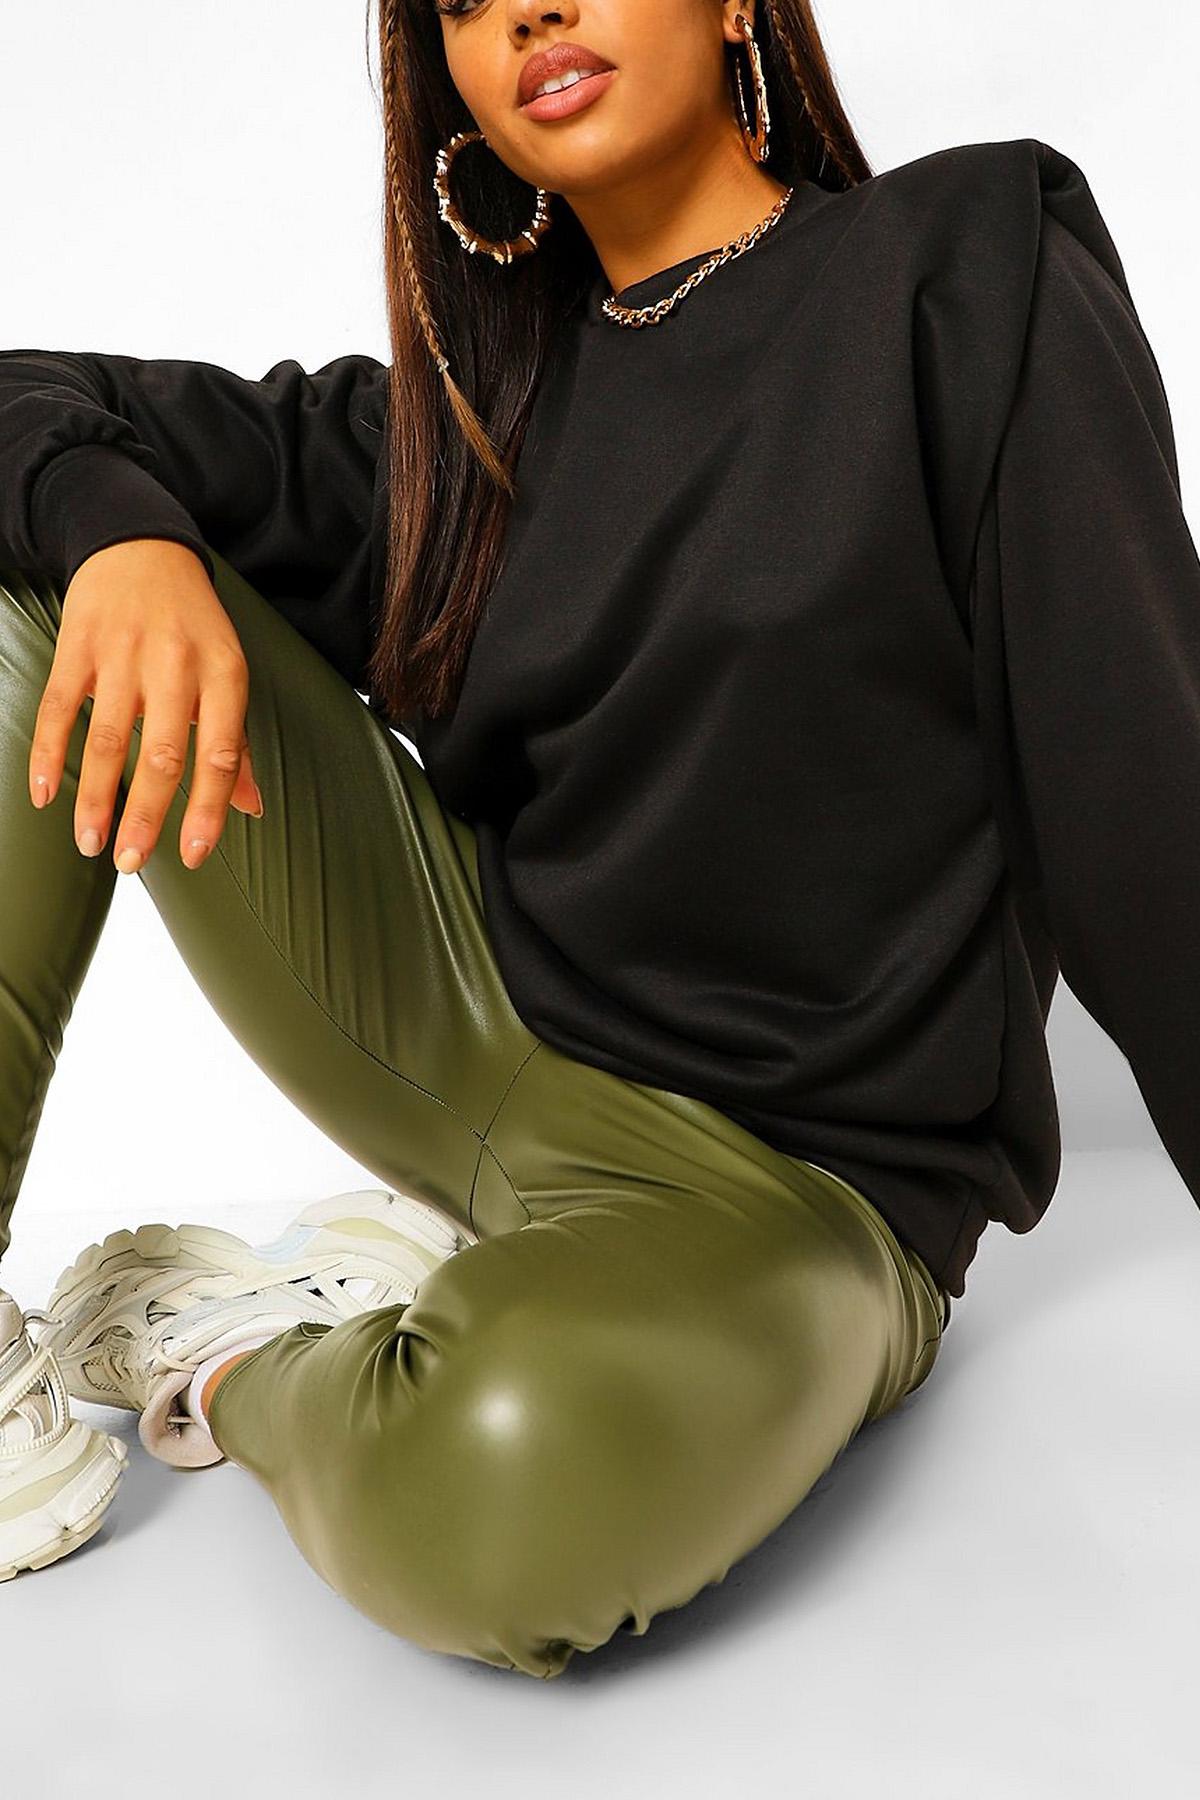 XHAN - Siyah Vatkalı Sweatshirt 1KXK8-44260-02